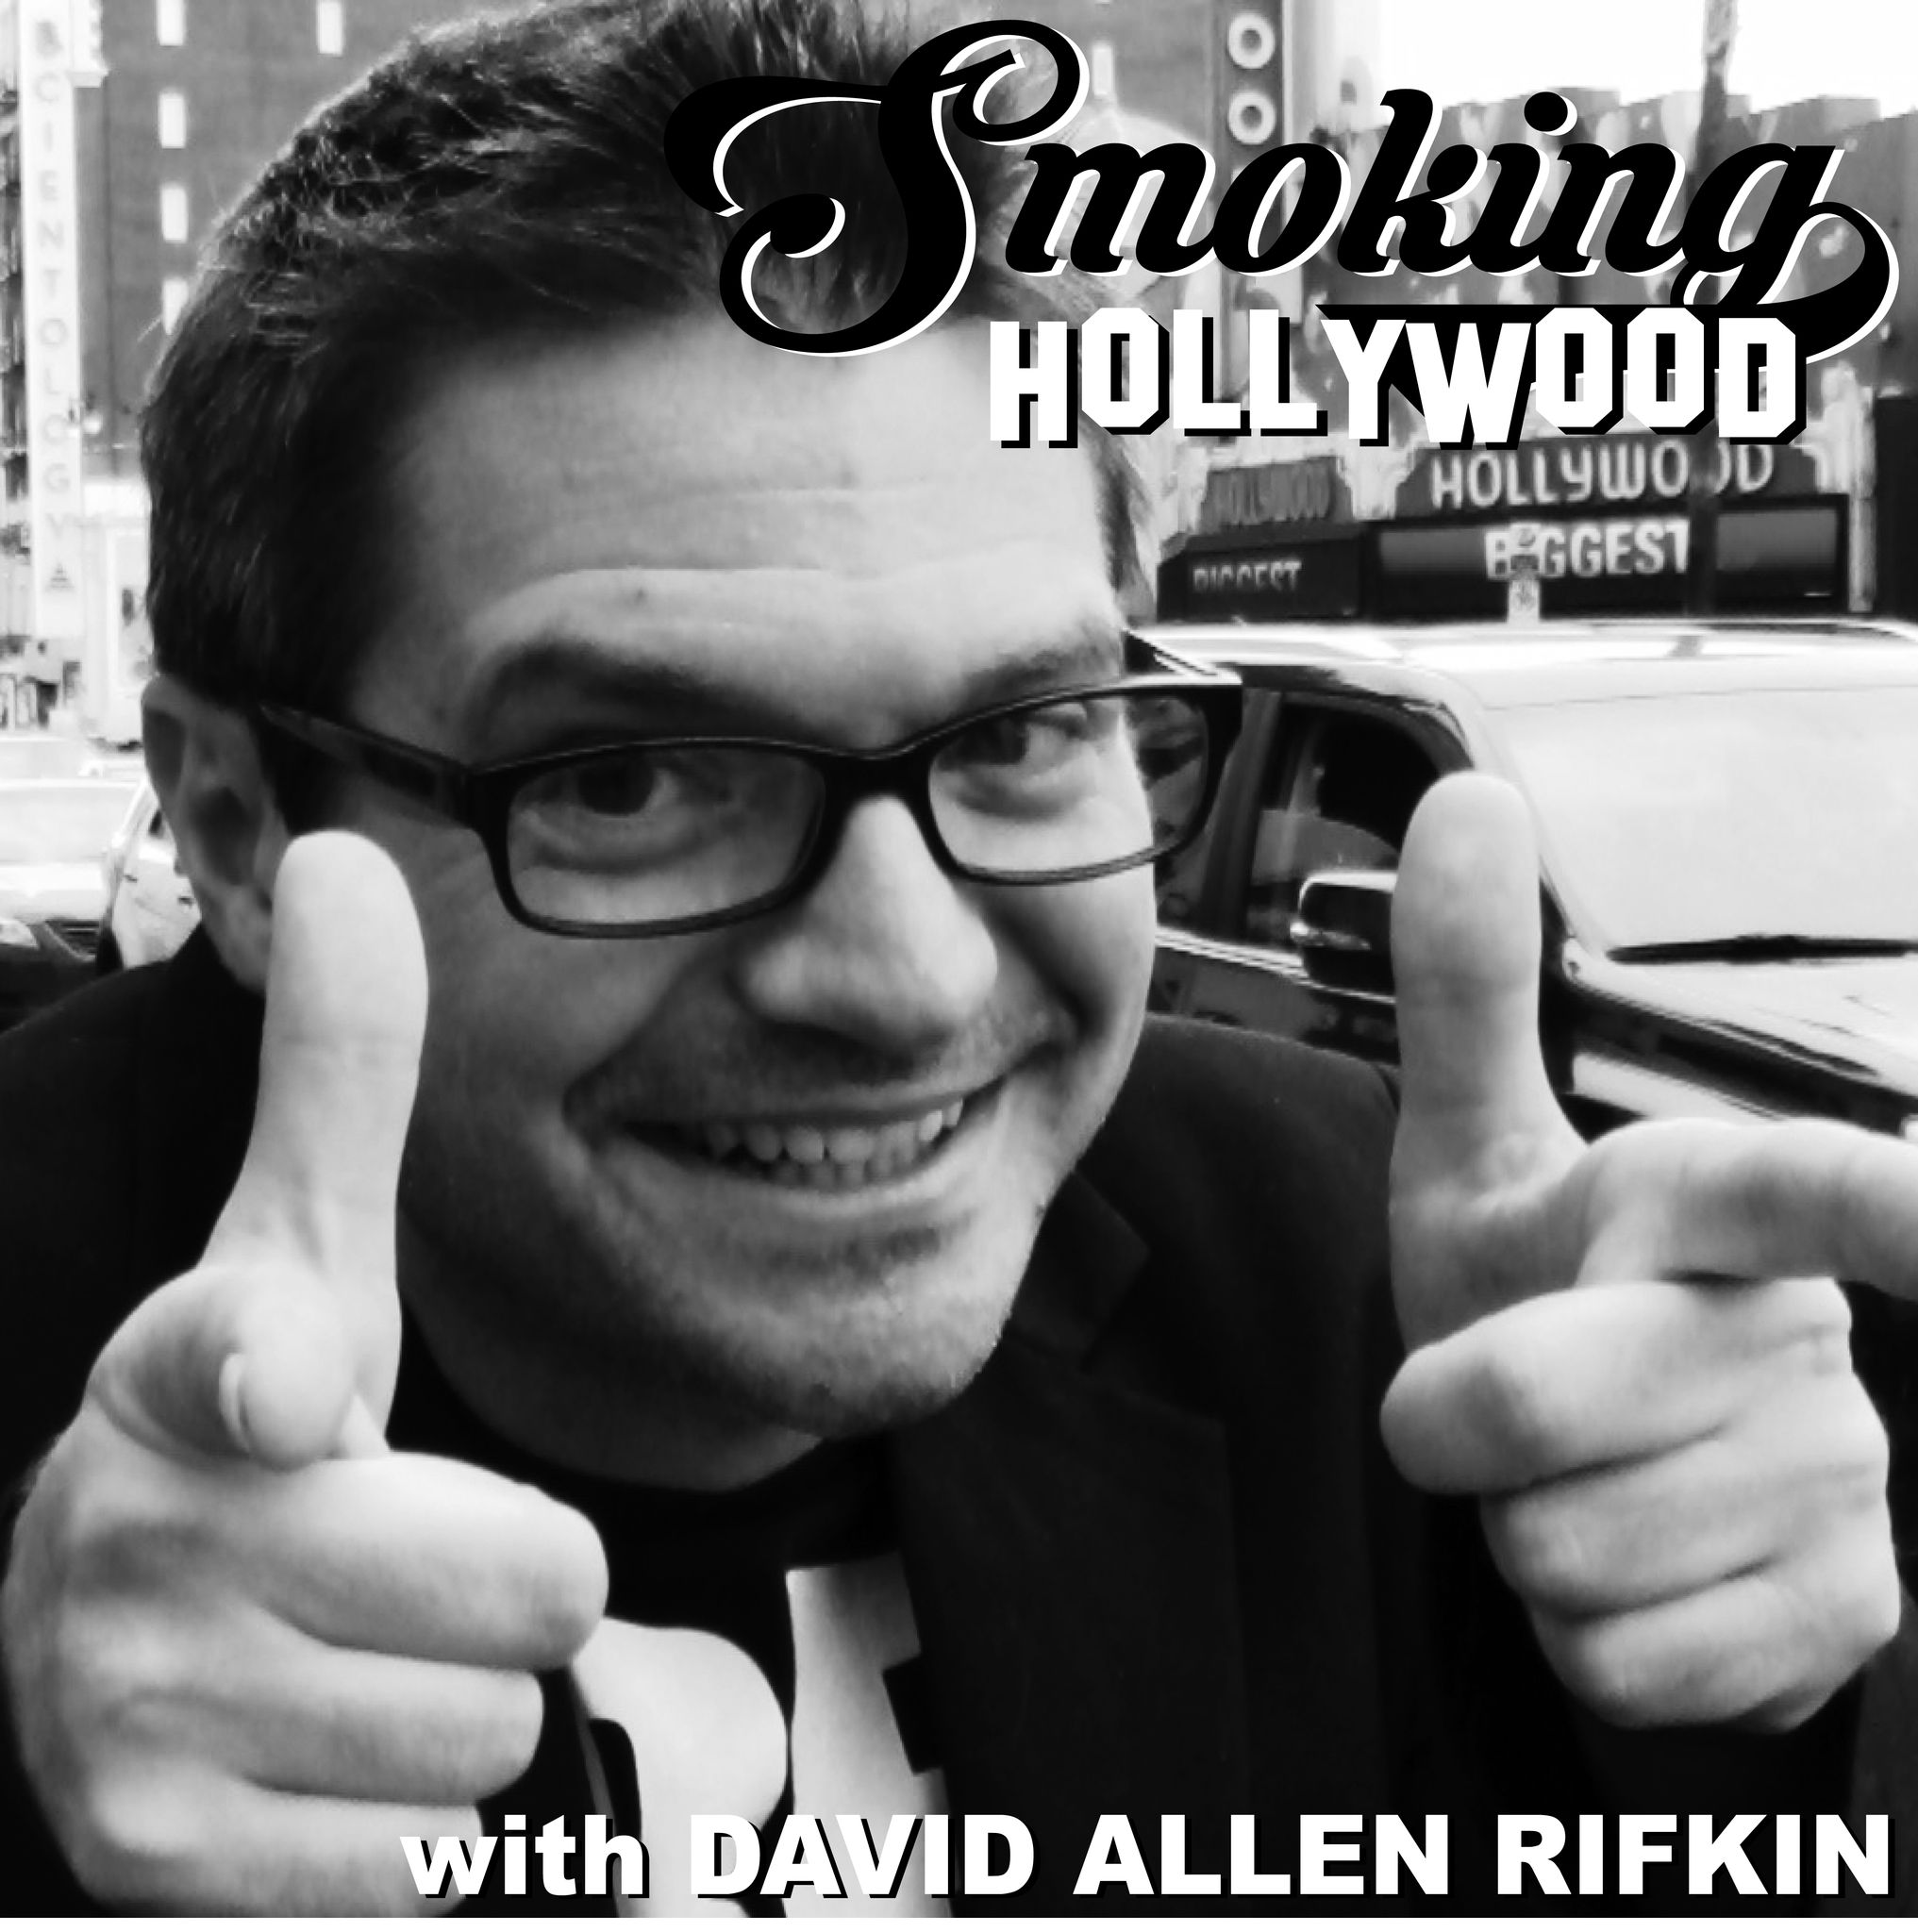 Smoking Hollywood with David Allen Rifkin